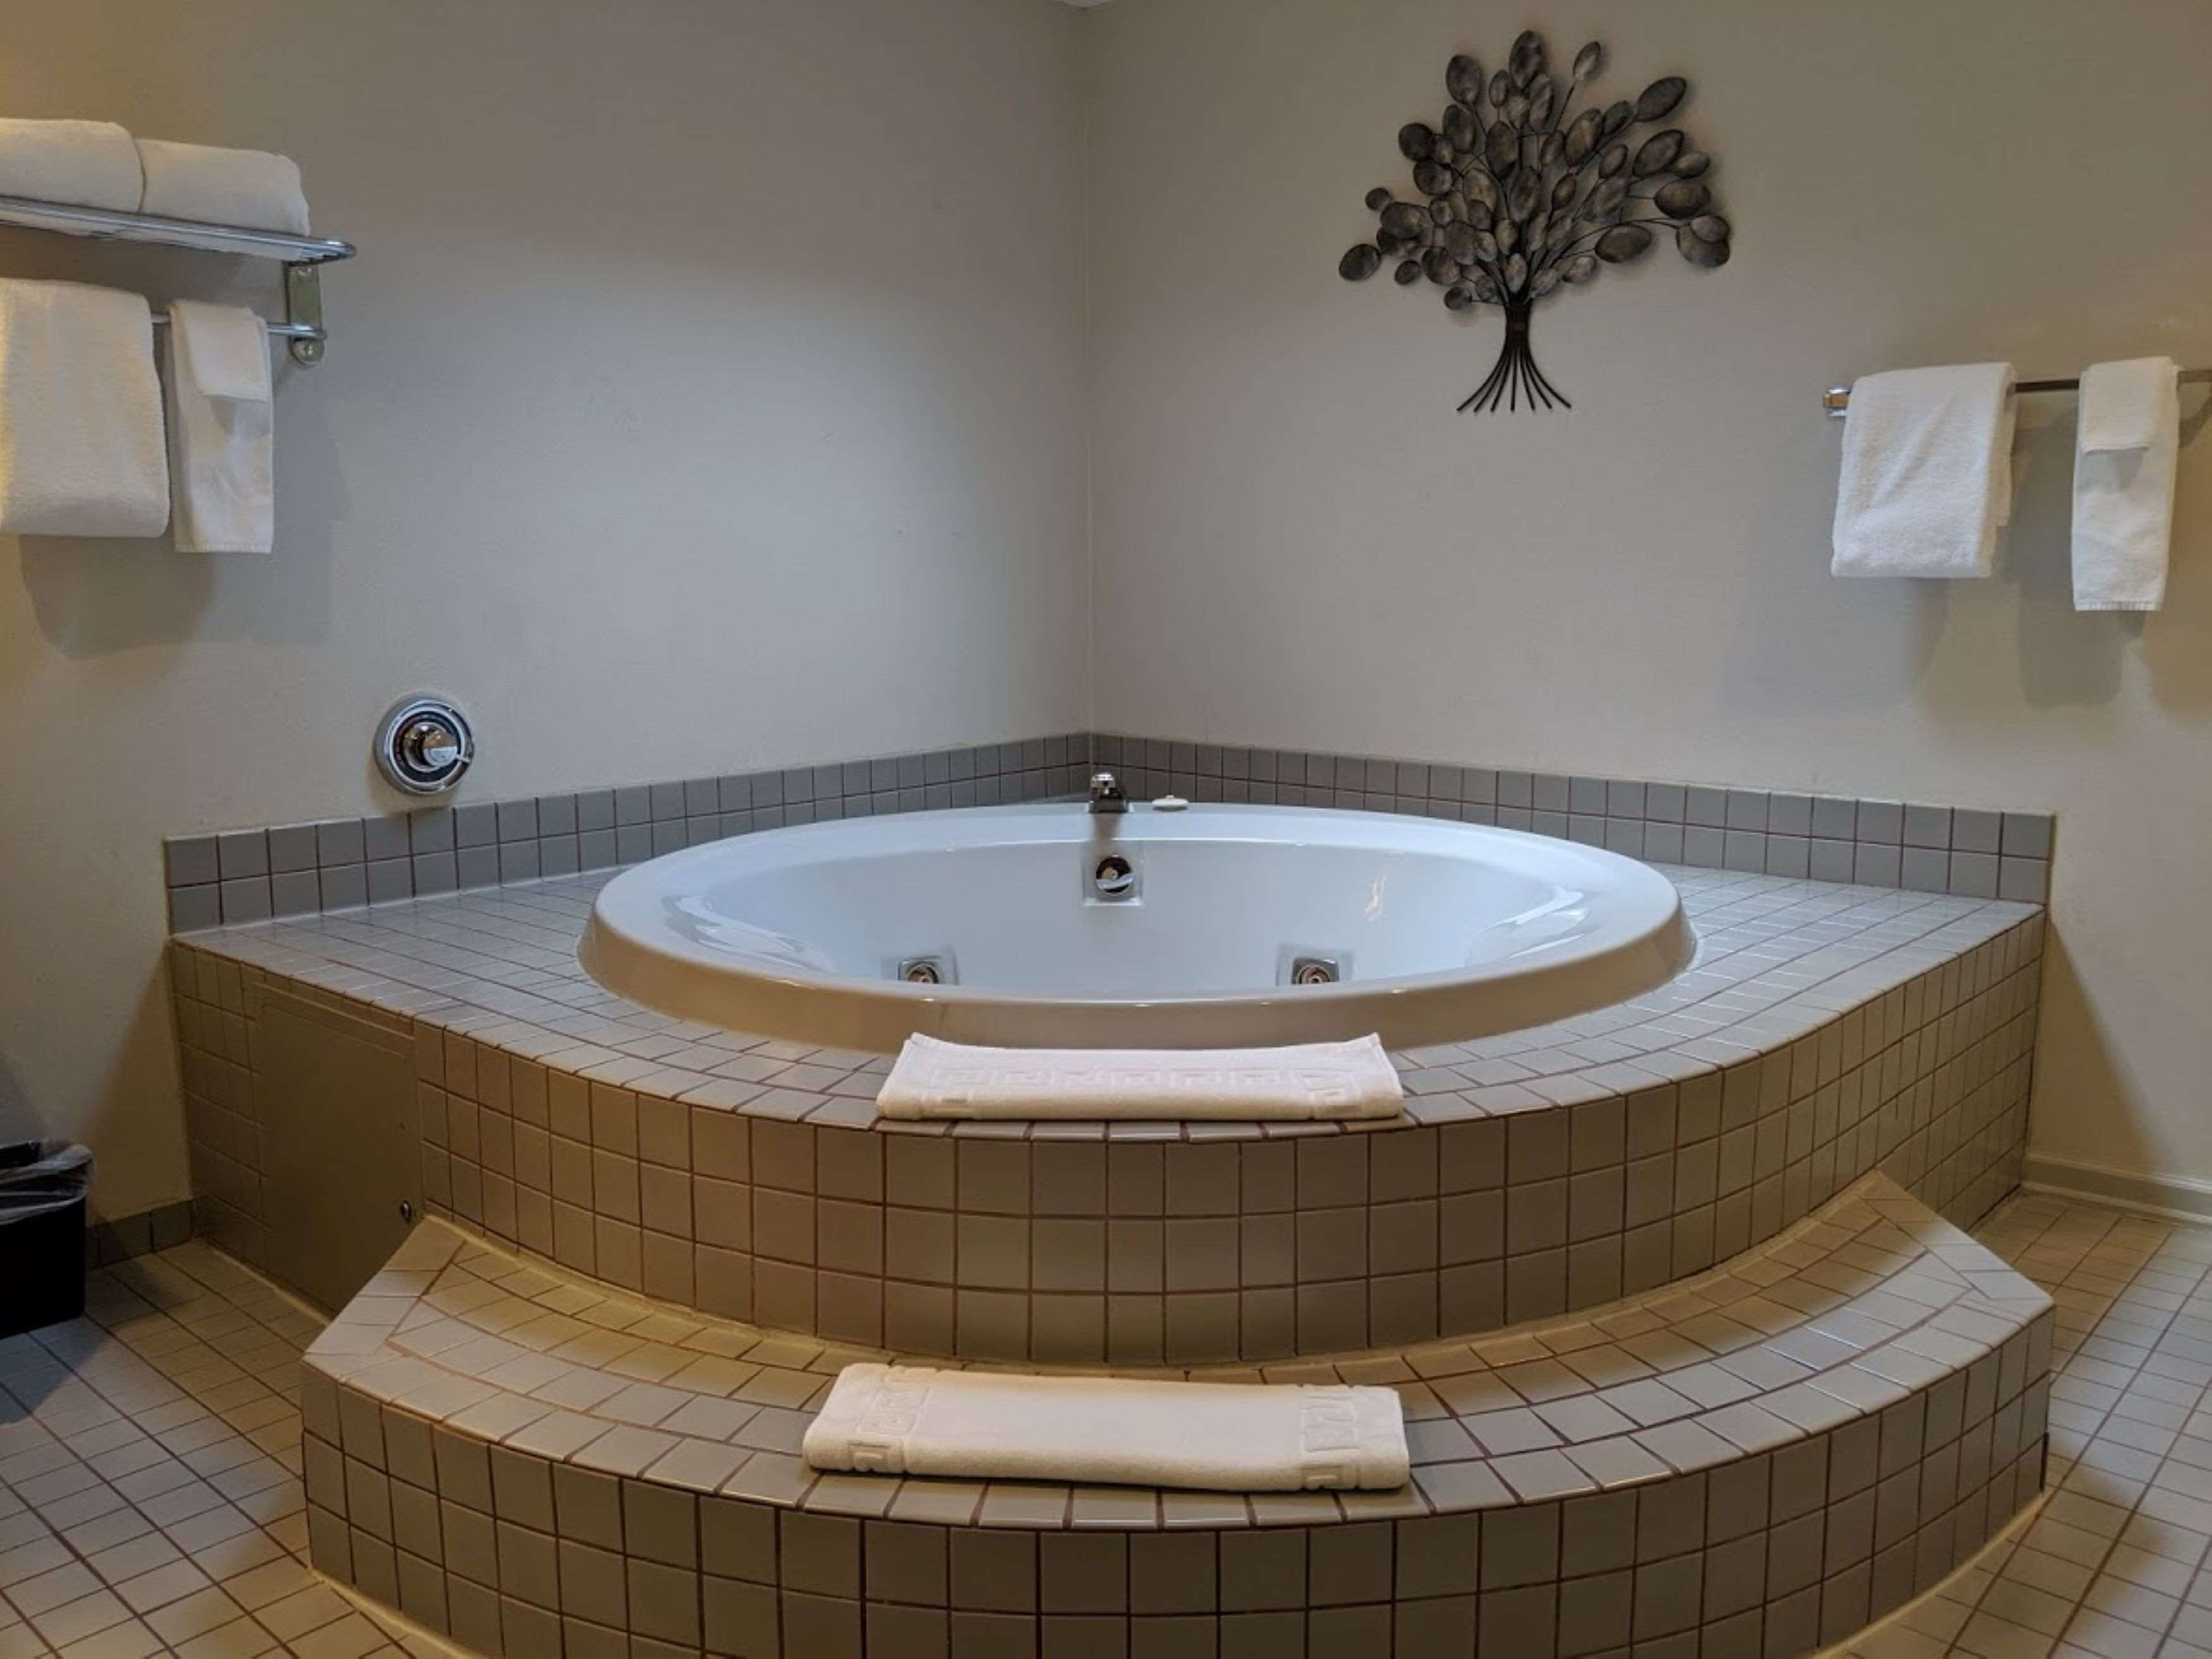 Surestay Hotel By Best Western Chilliwack in Chilliwack: King Suite Atrium Jacuzi Tub